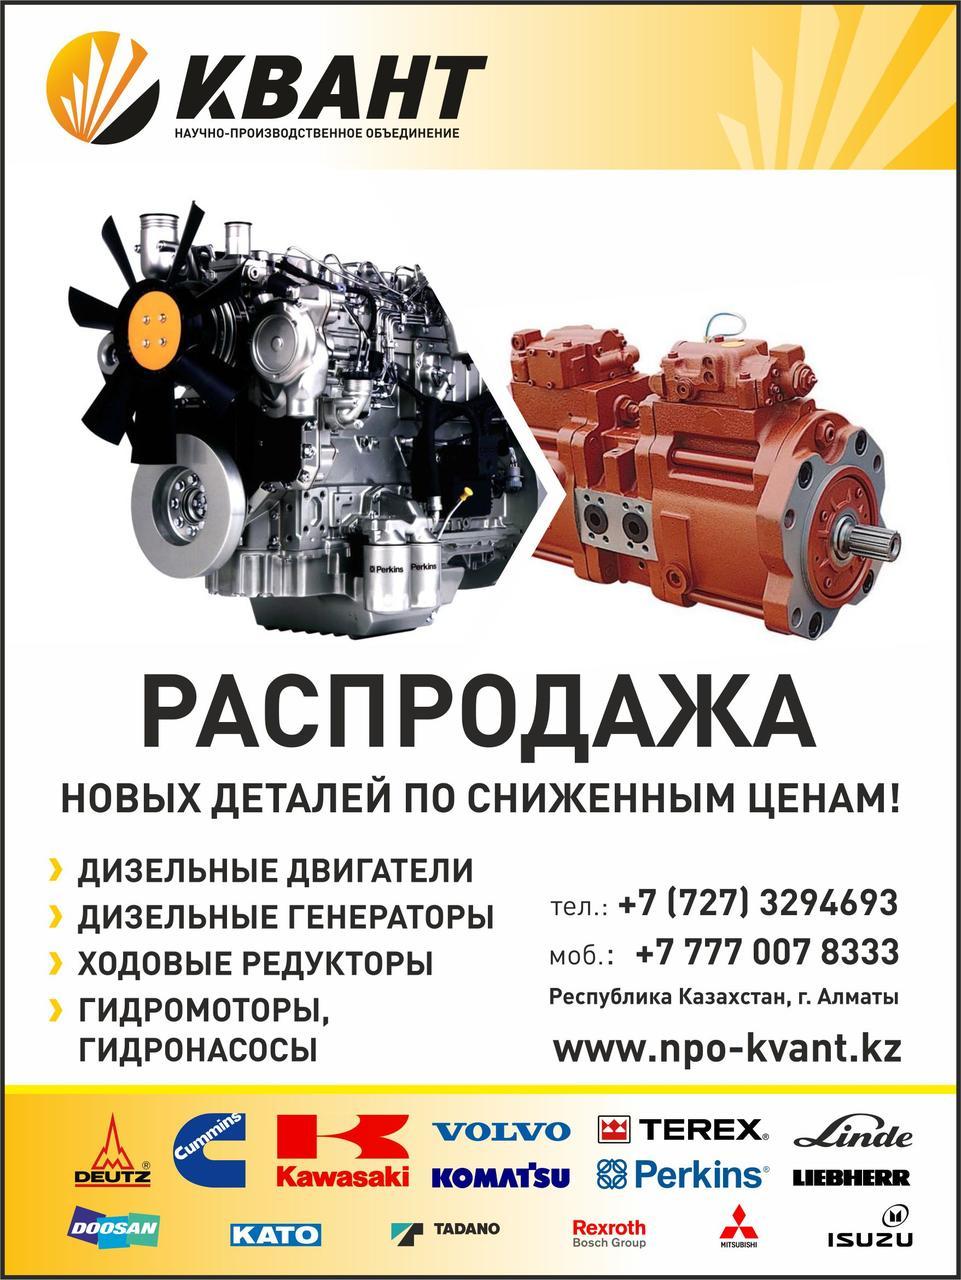 Двигатель Deutz BF6M1015, Deutz BF6M1015C, Deutz BF6M2012, Deutz BF6M2012C, Deutz BV6M536, Deutz BV6M628